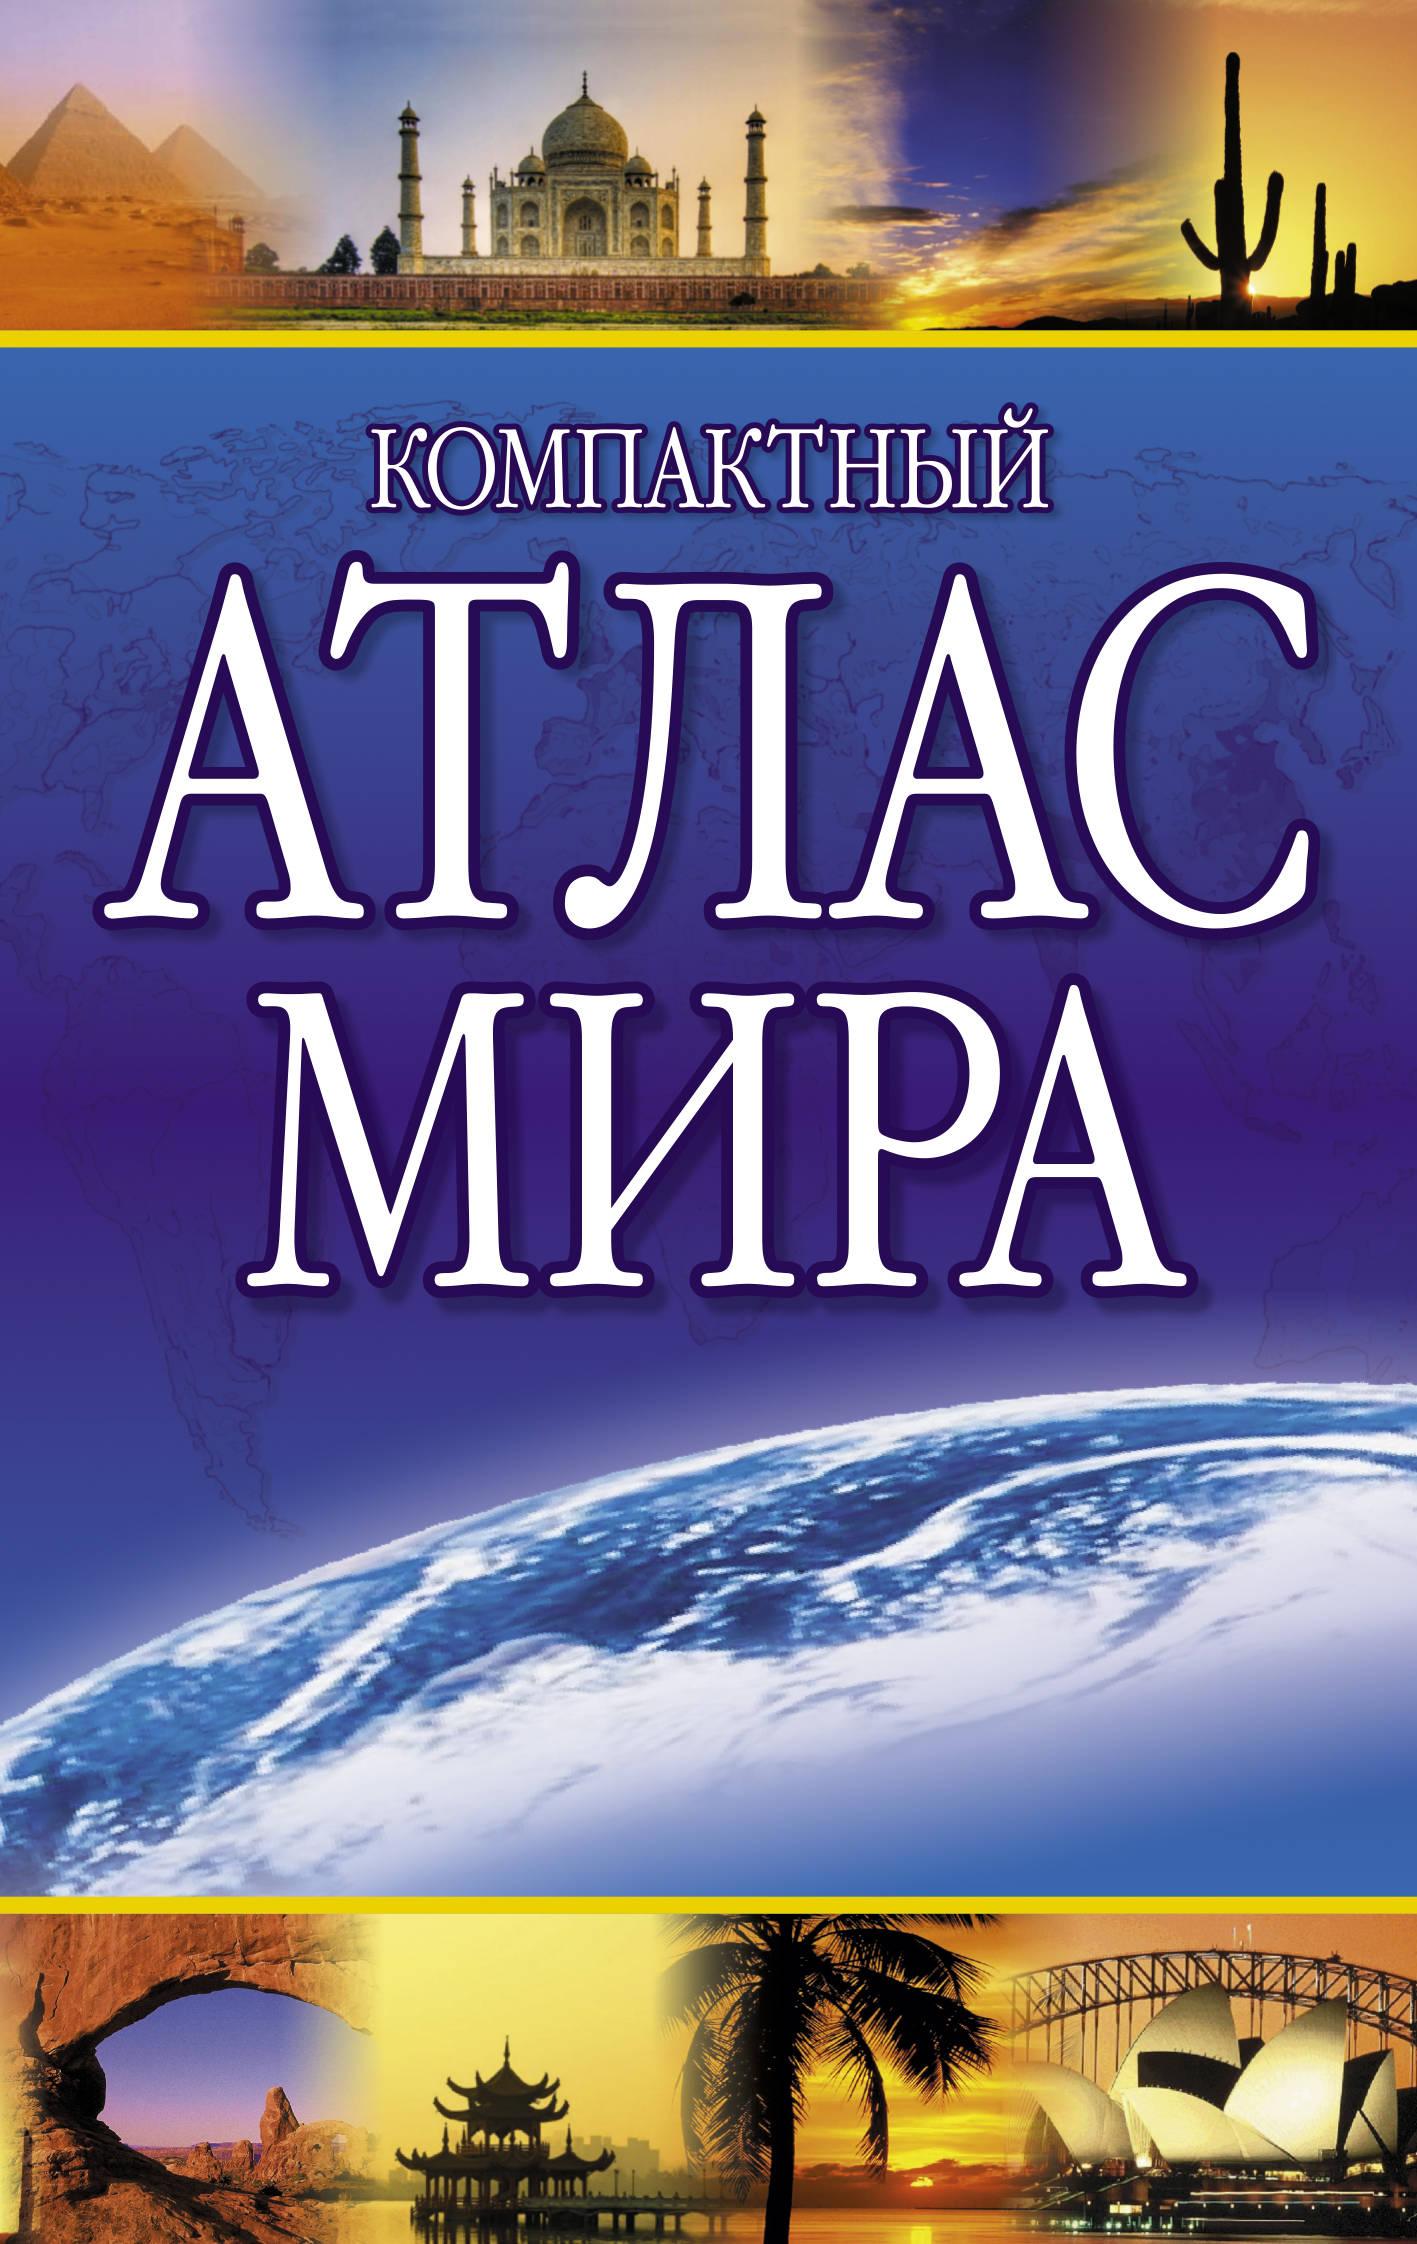 Kompaktnyj atlas mira